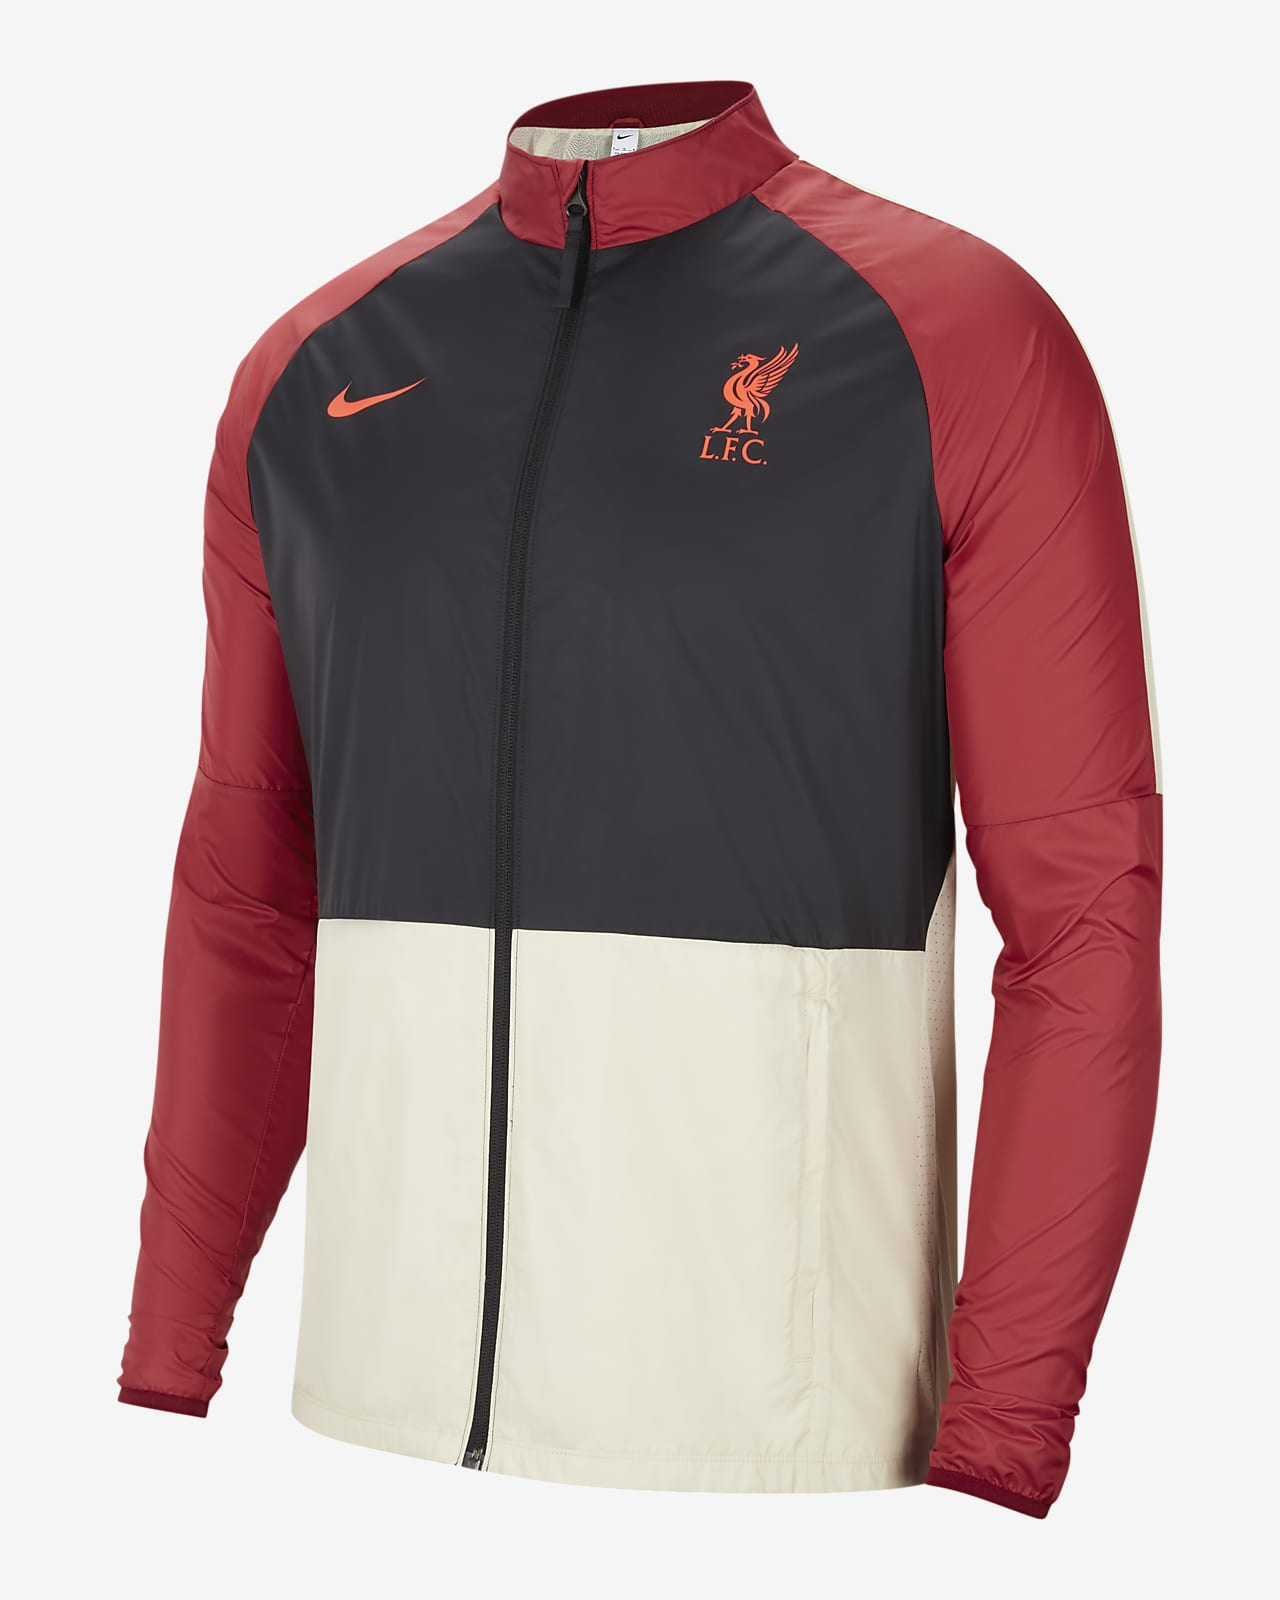 Liverpool F.C. Repel Academy AWF Men's Football Jacket